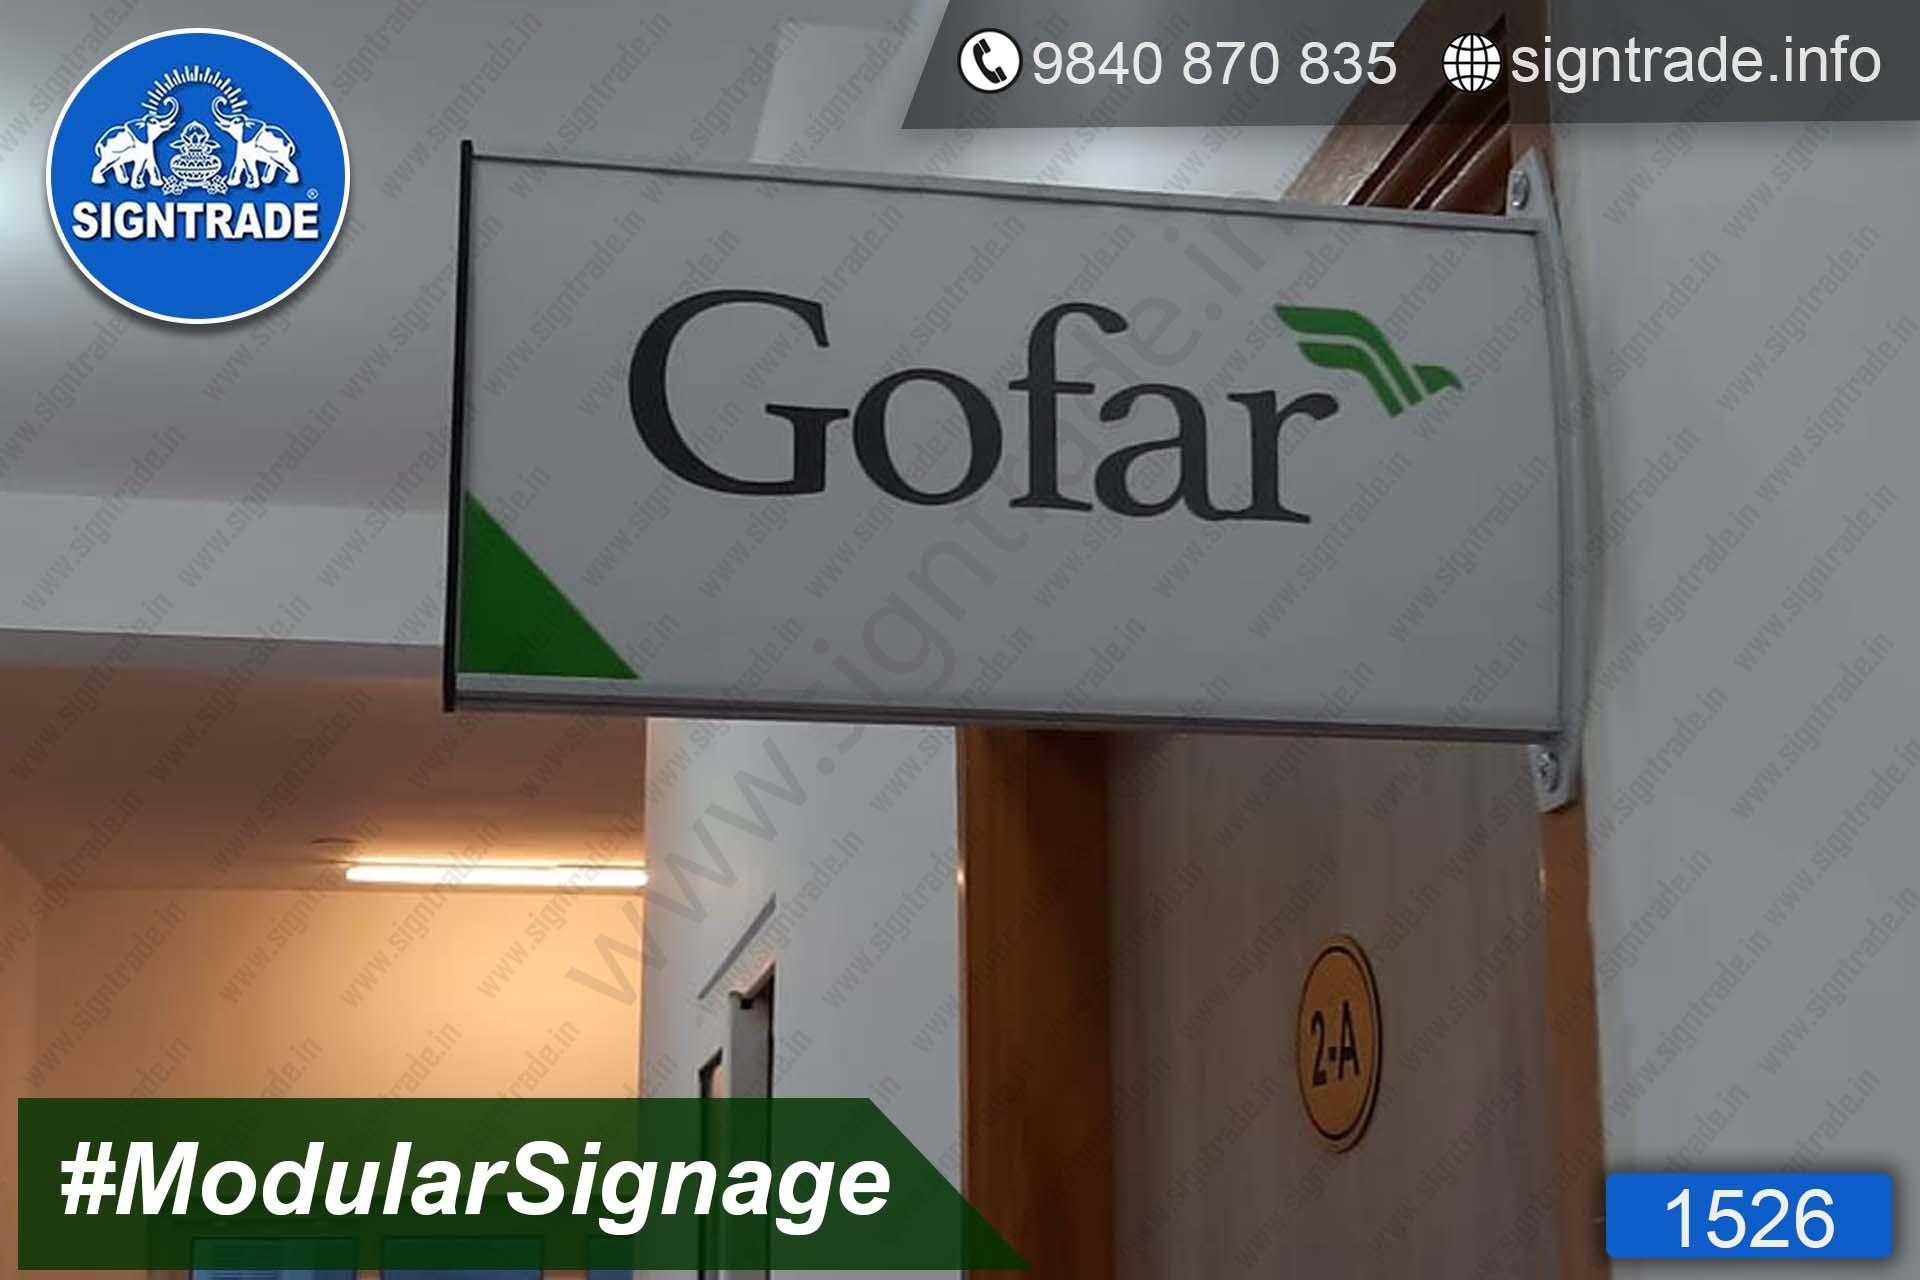 gofar modular signage